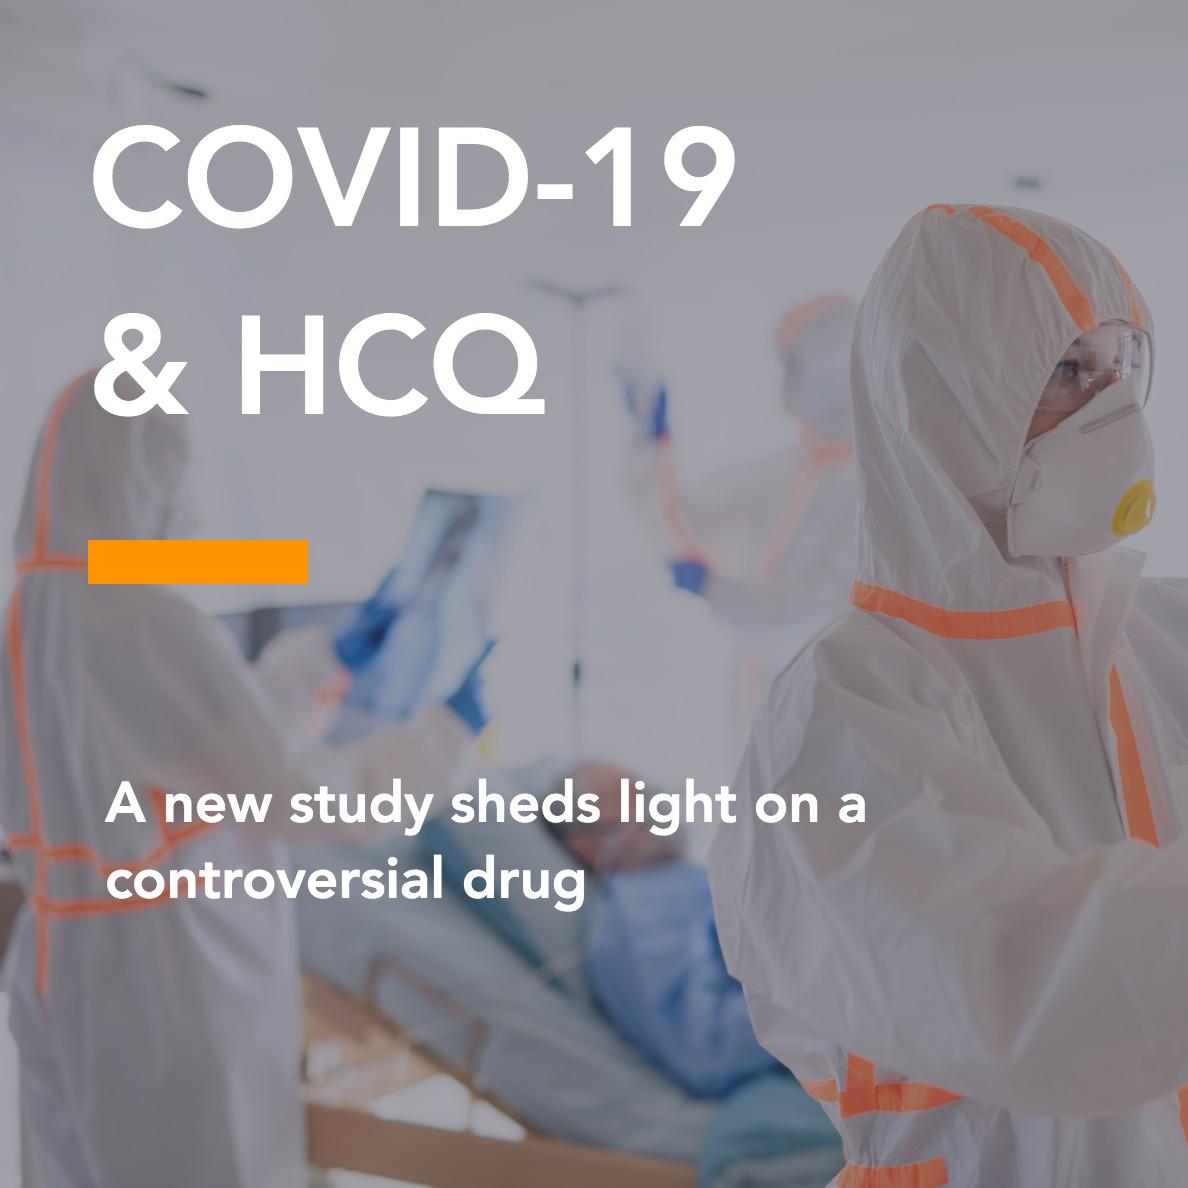 COVID-19 & Hydroxychloroquine Study